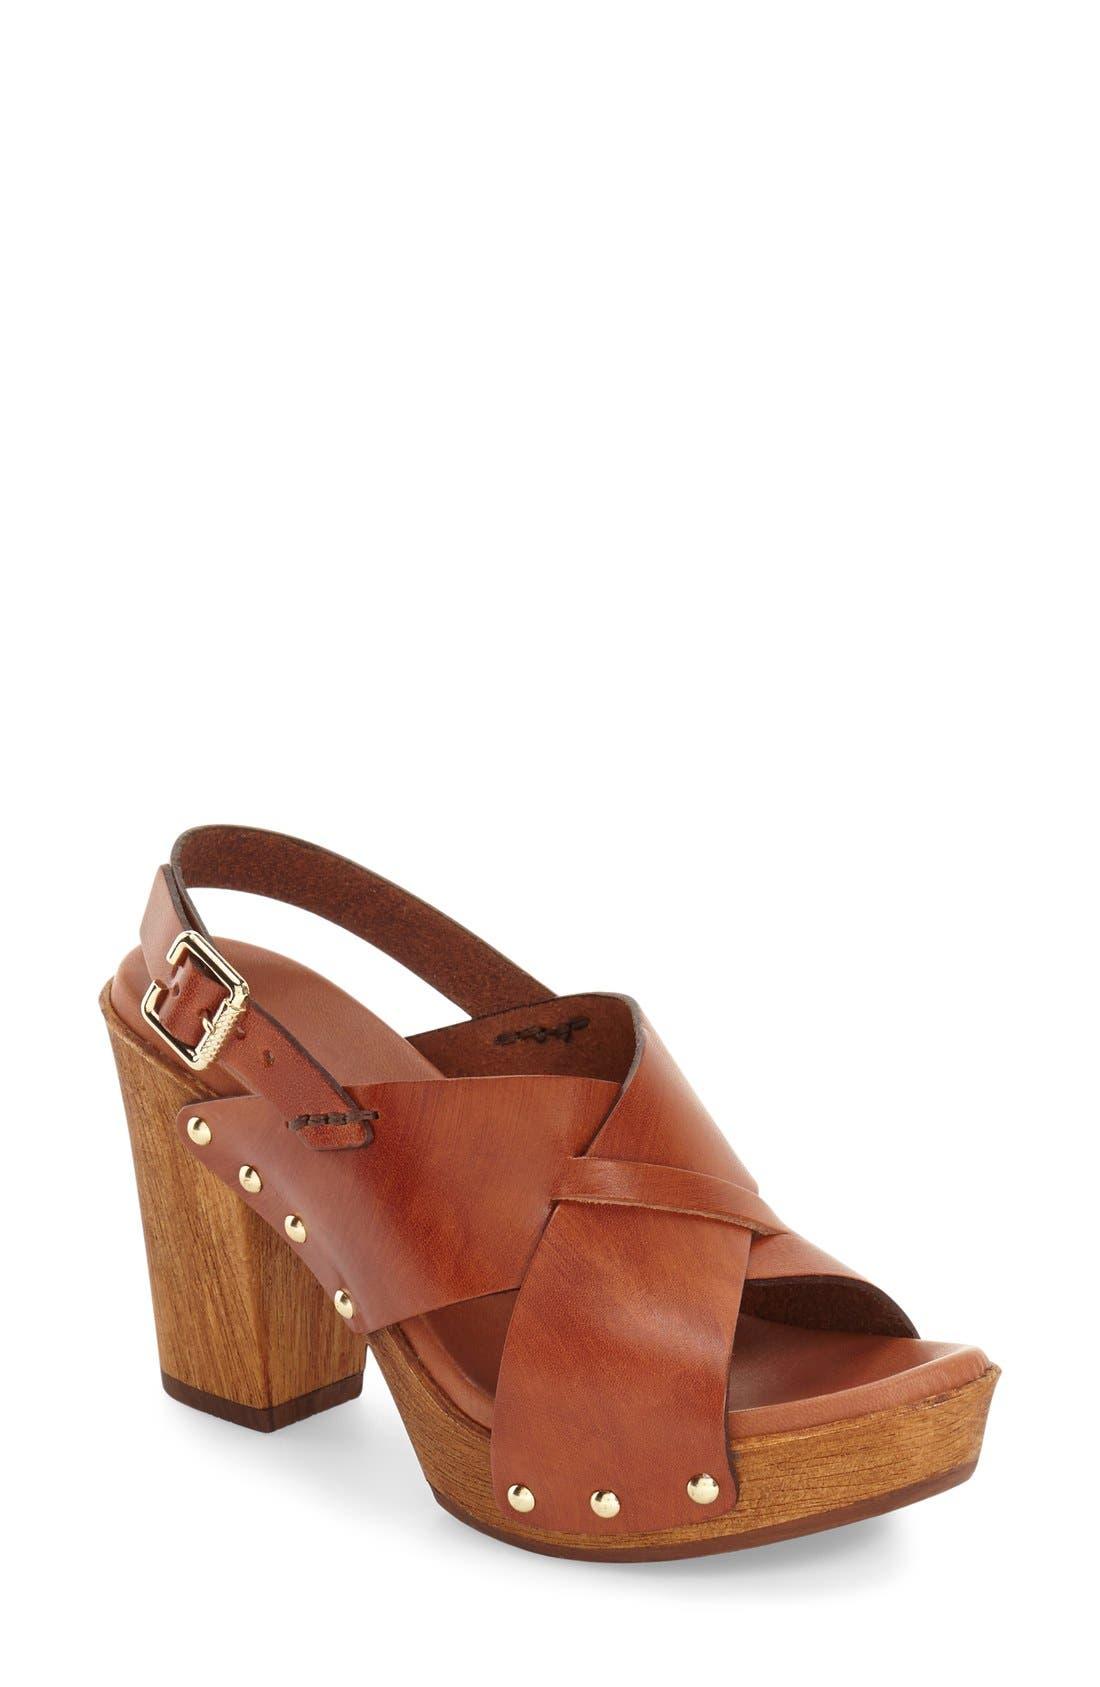 Main Image - Kenneth Cole New York 'Belle' Platform Sandal (Women)